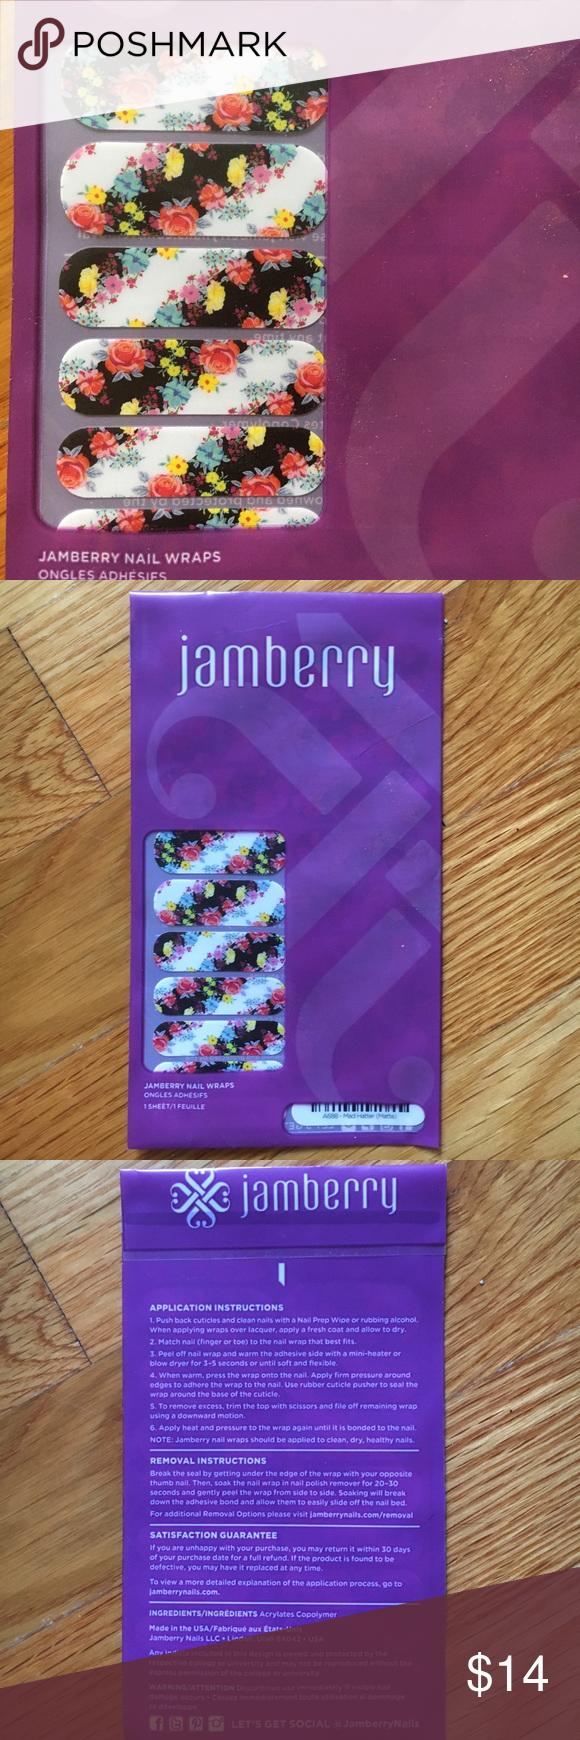 Price firm - NWT Jamberry nail wraps   Jamberry nails, Jamberry nail ...